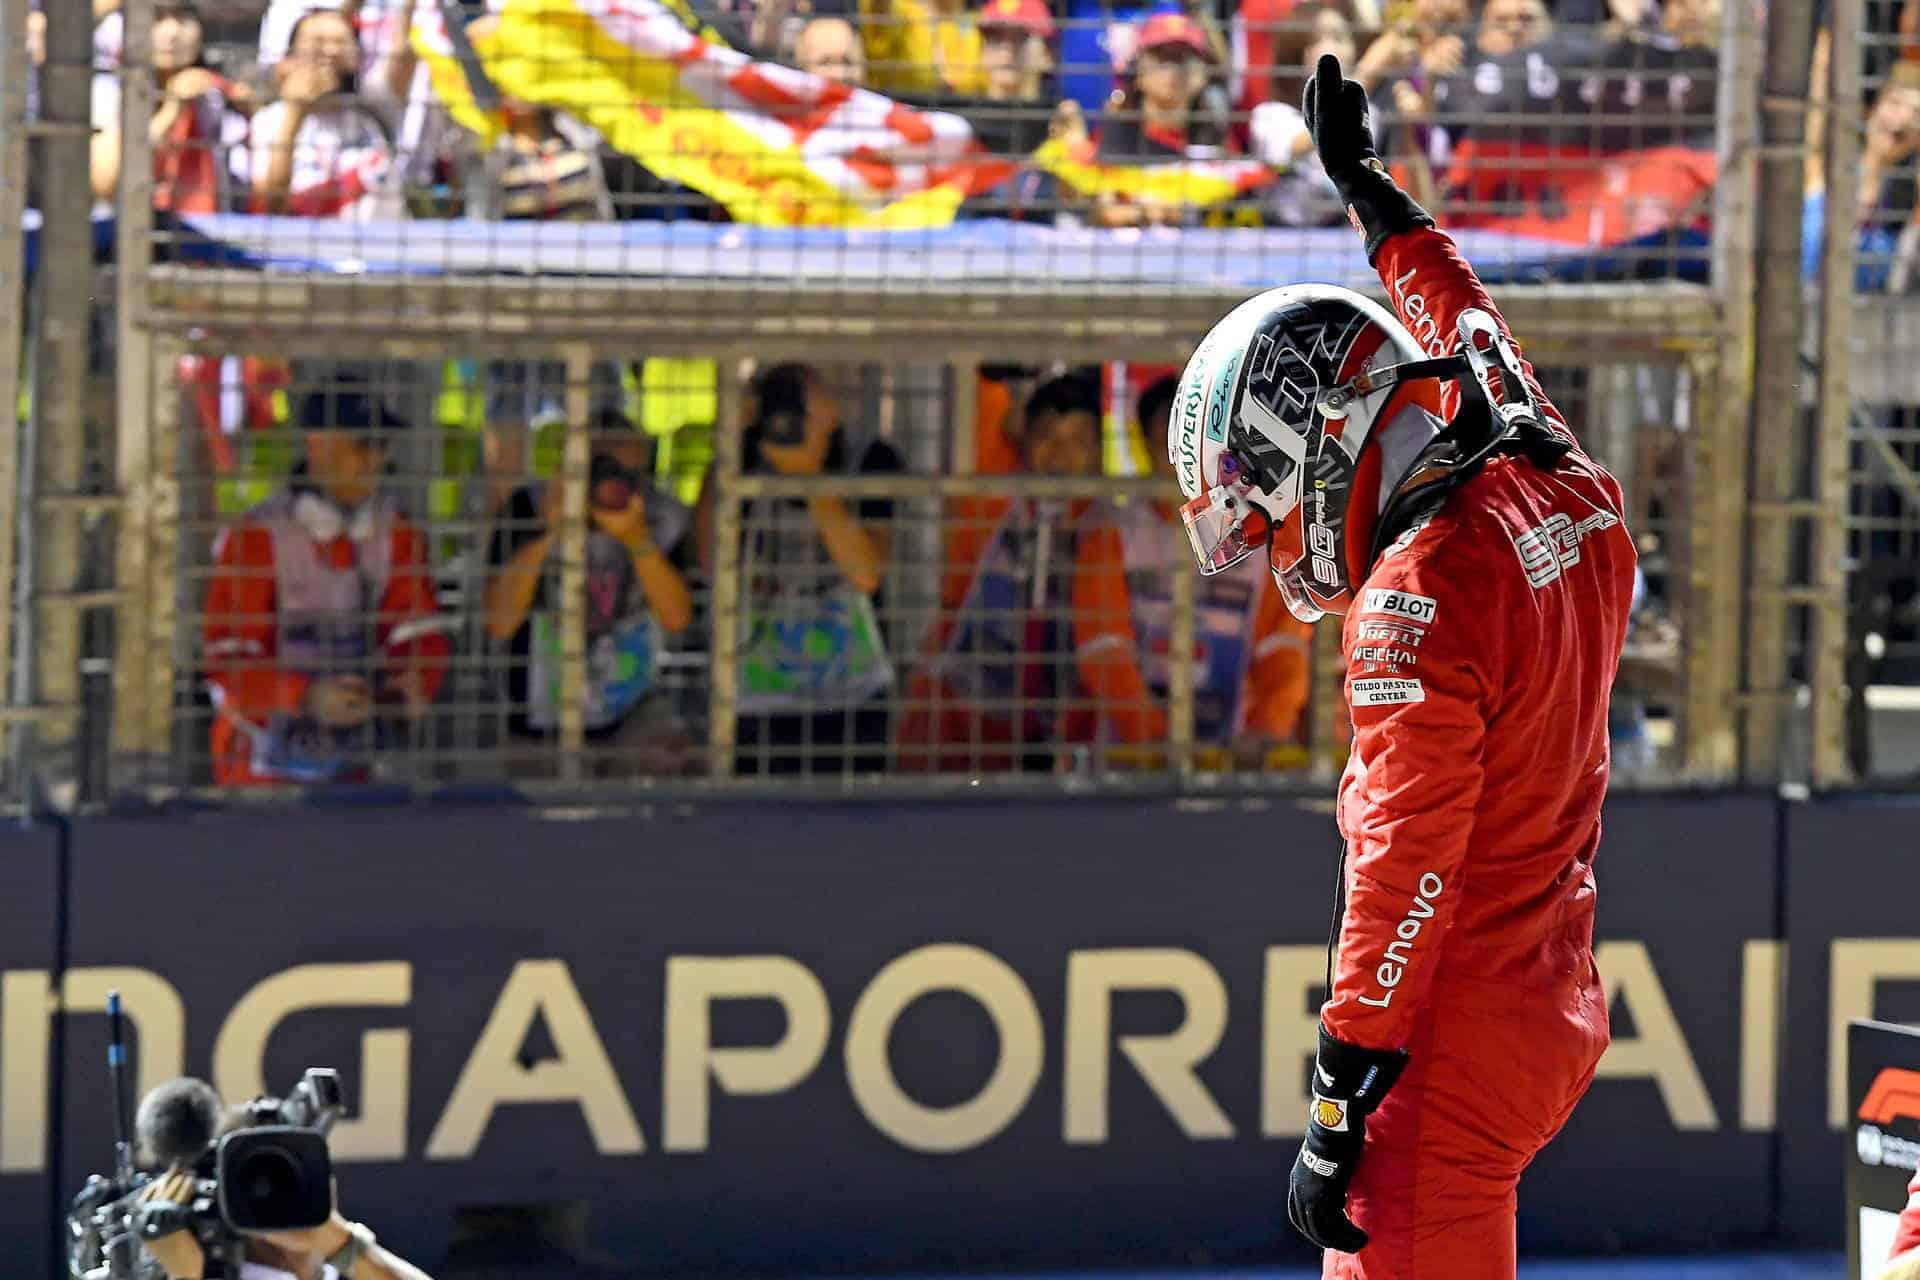 Charles Leclerc Ferrari SF90 Singapore GP F1 2019 after Qualifying celebrating pole Photo Ferrari